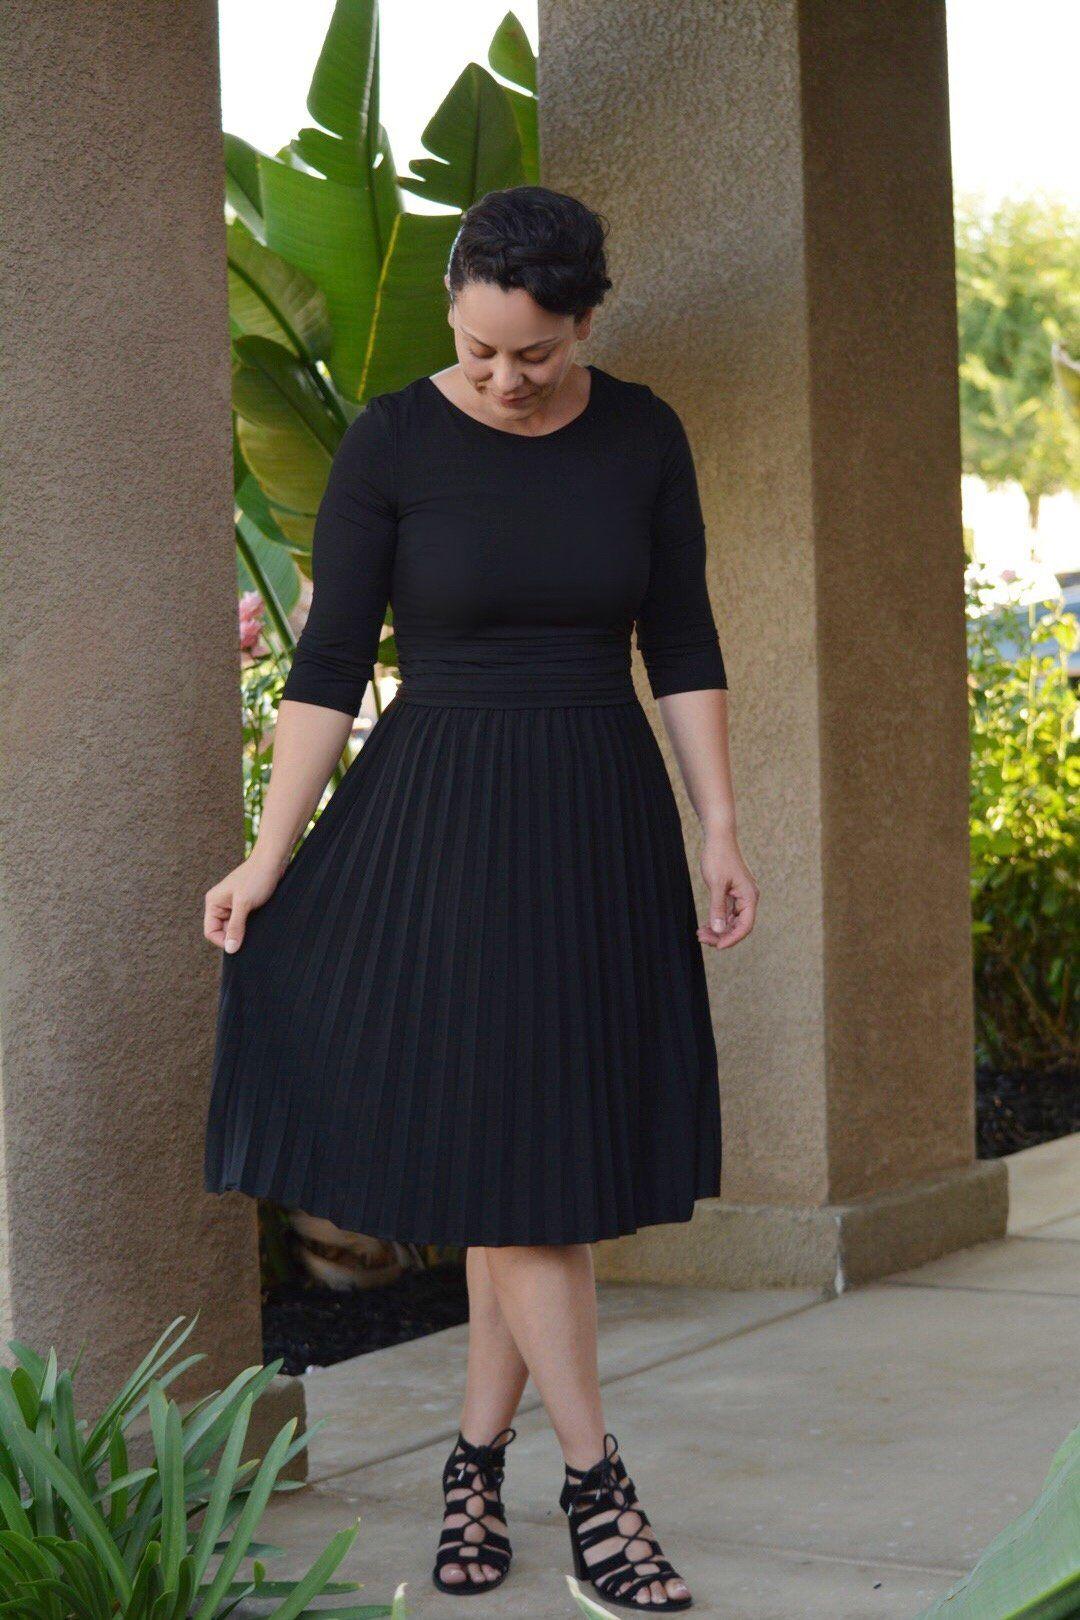 Marseille Black Dress Fashion Holiday Outfits Women Black Funeral Dress [ 1620 x 1080 Pixel ]